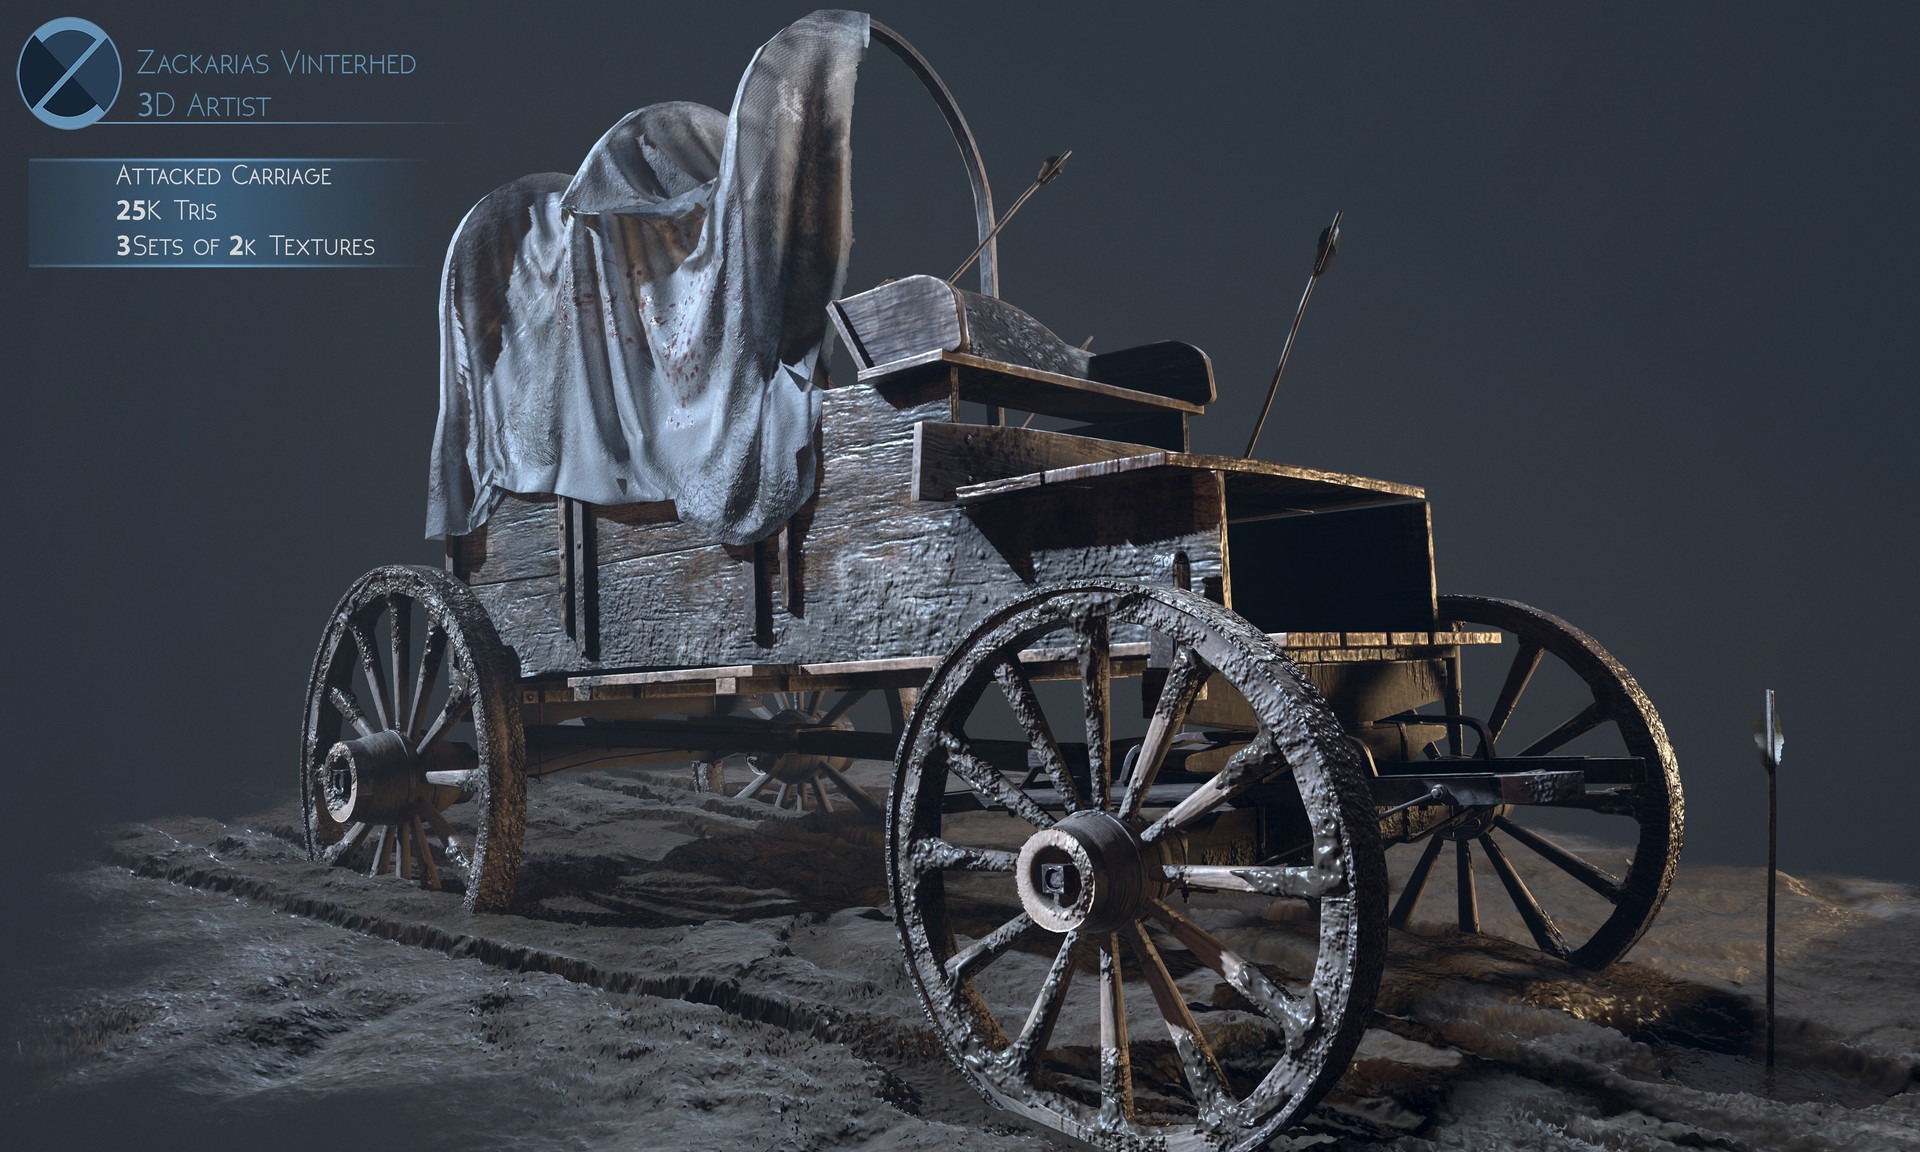 Zackarias vinterhed carriage 04